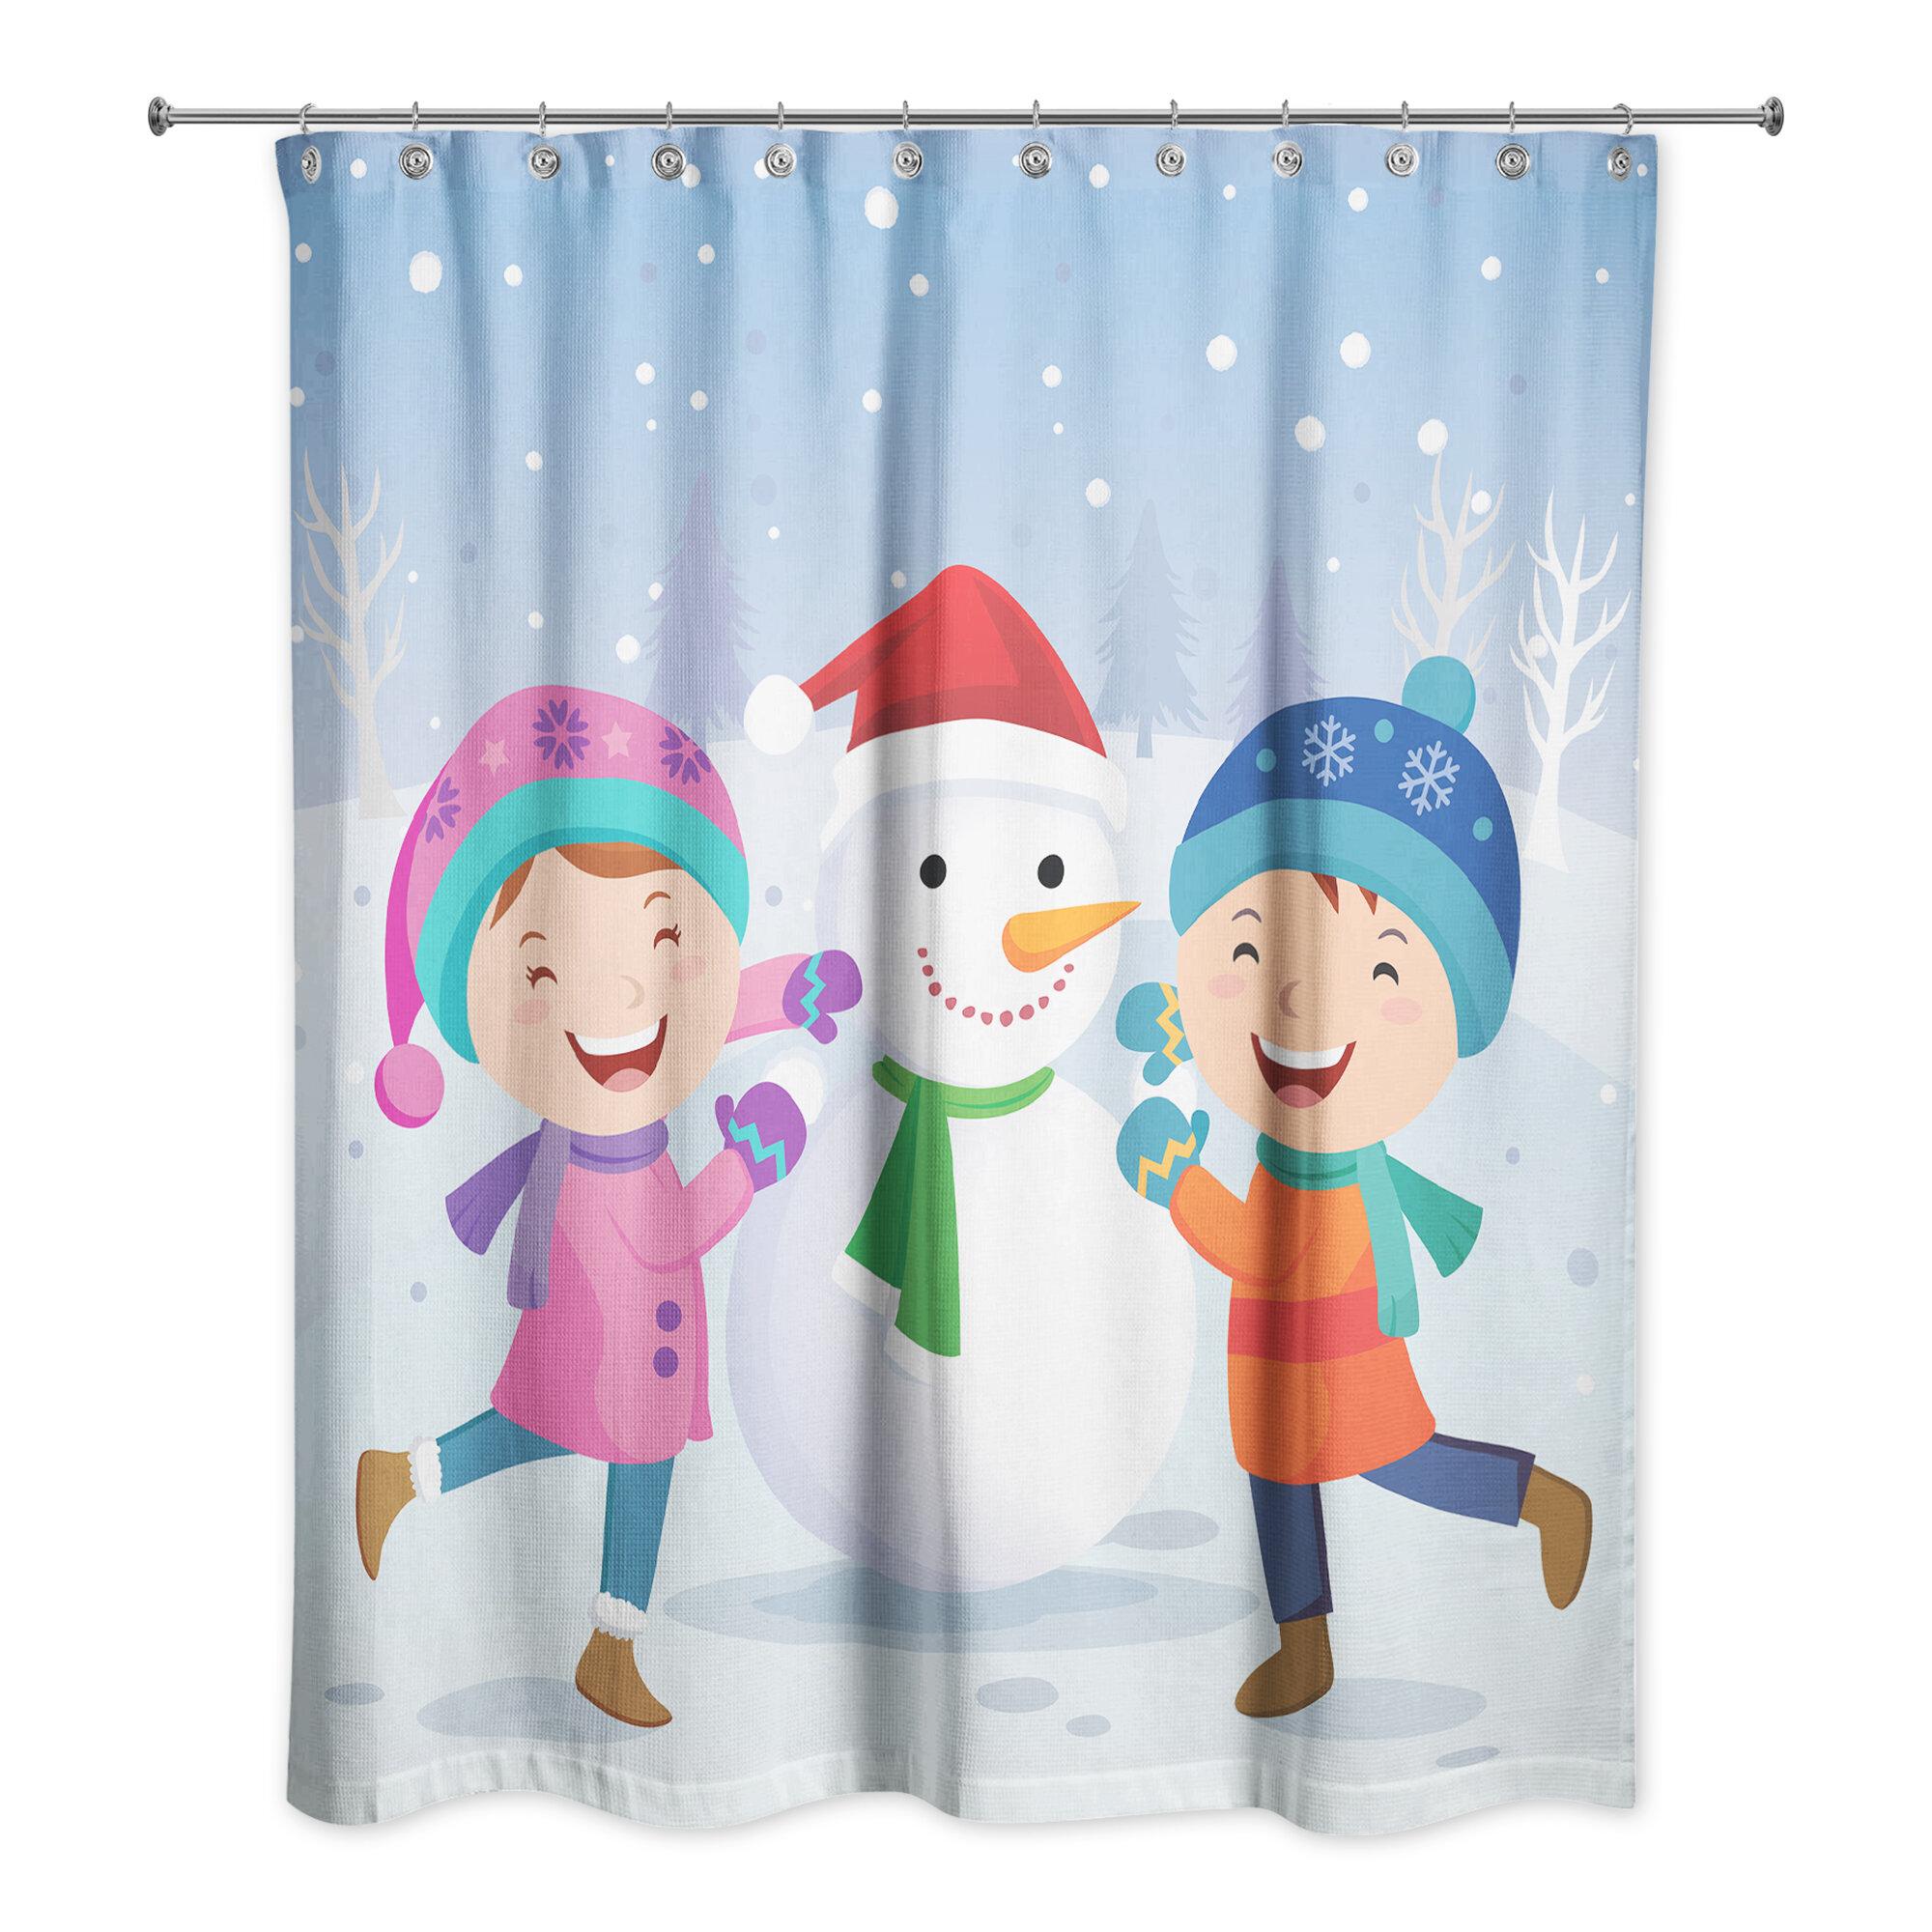 The Holiday Aisle Grandy Children Snowman Scene Single Shower Curtain Wayfair